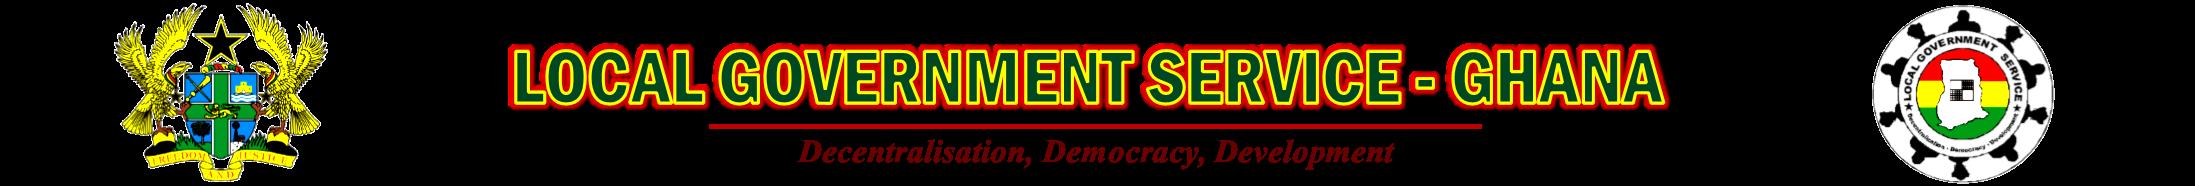 LOCAL GOVERNMENT SERVICE Logo